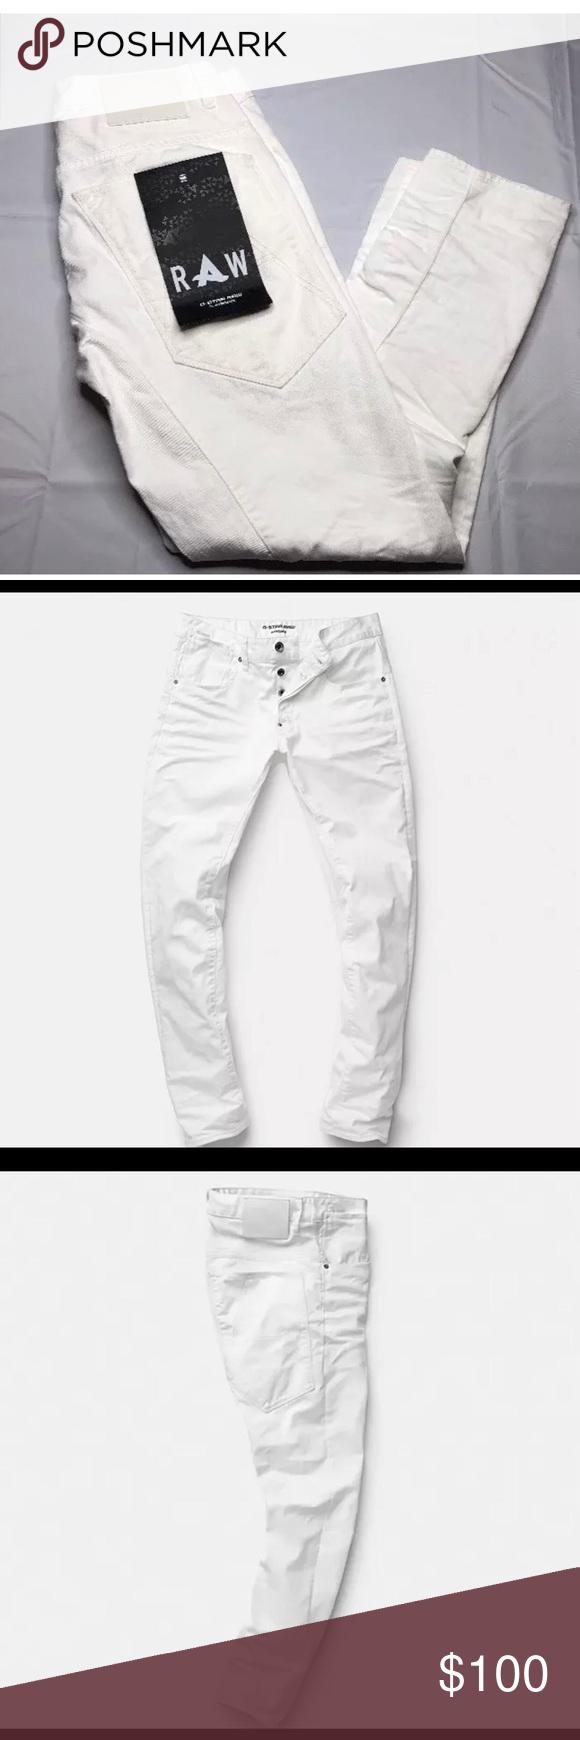 Men G Star raw Afro jack Sz 30x32 White NWT G Star Jeans